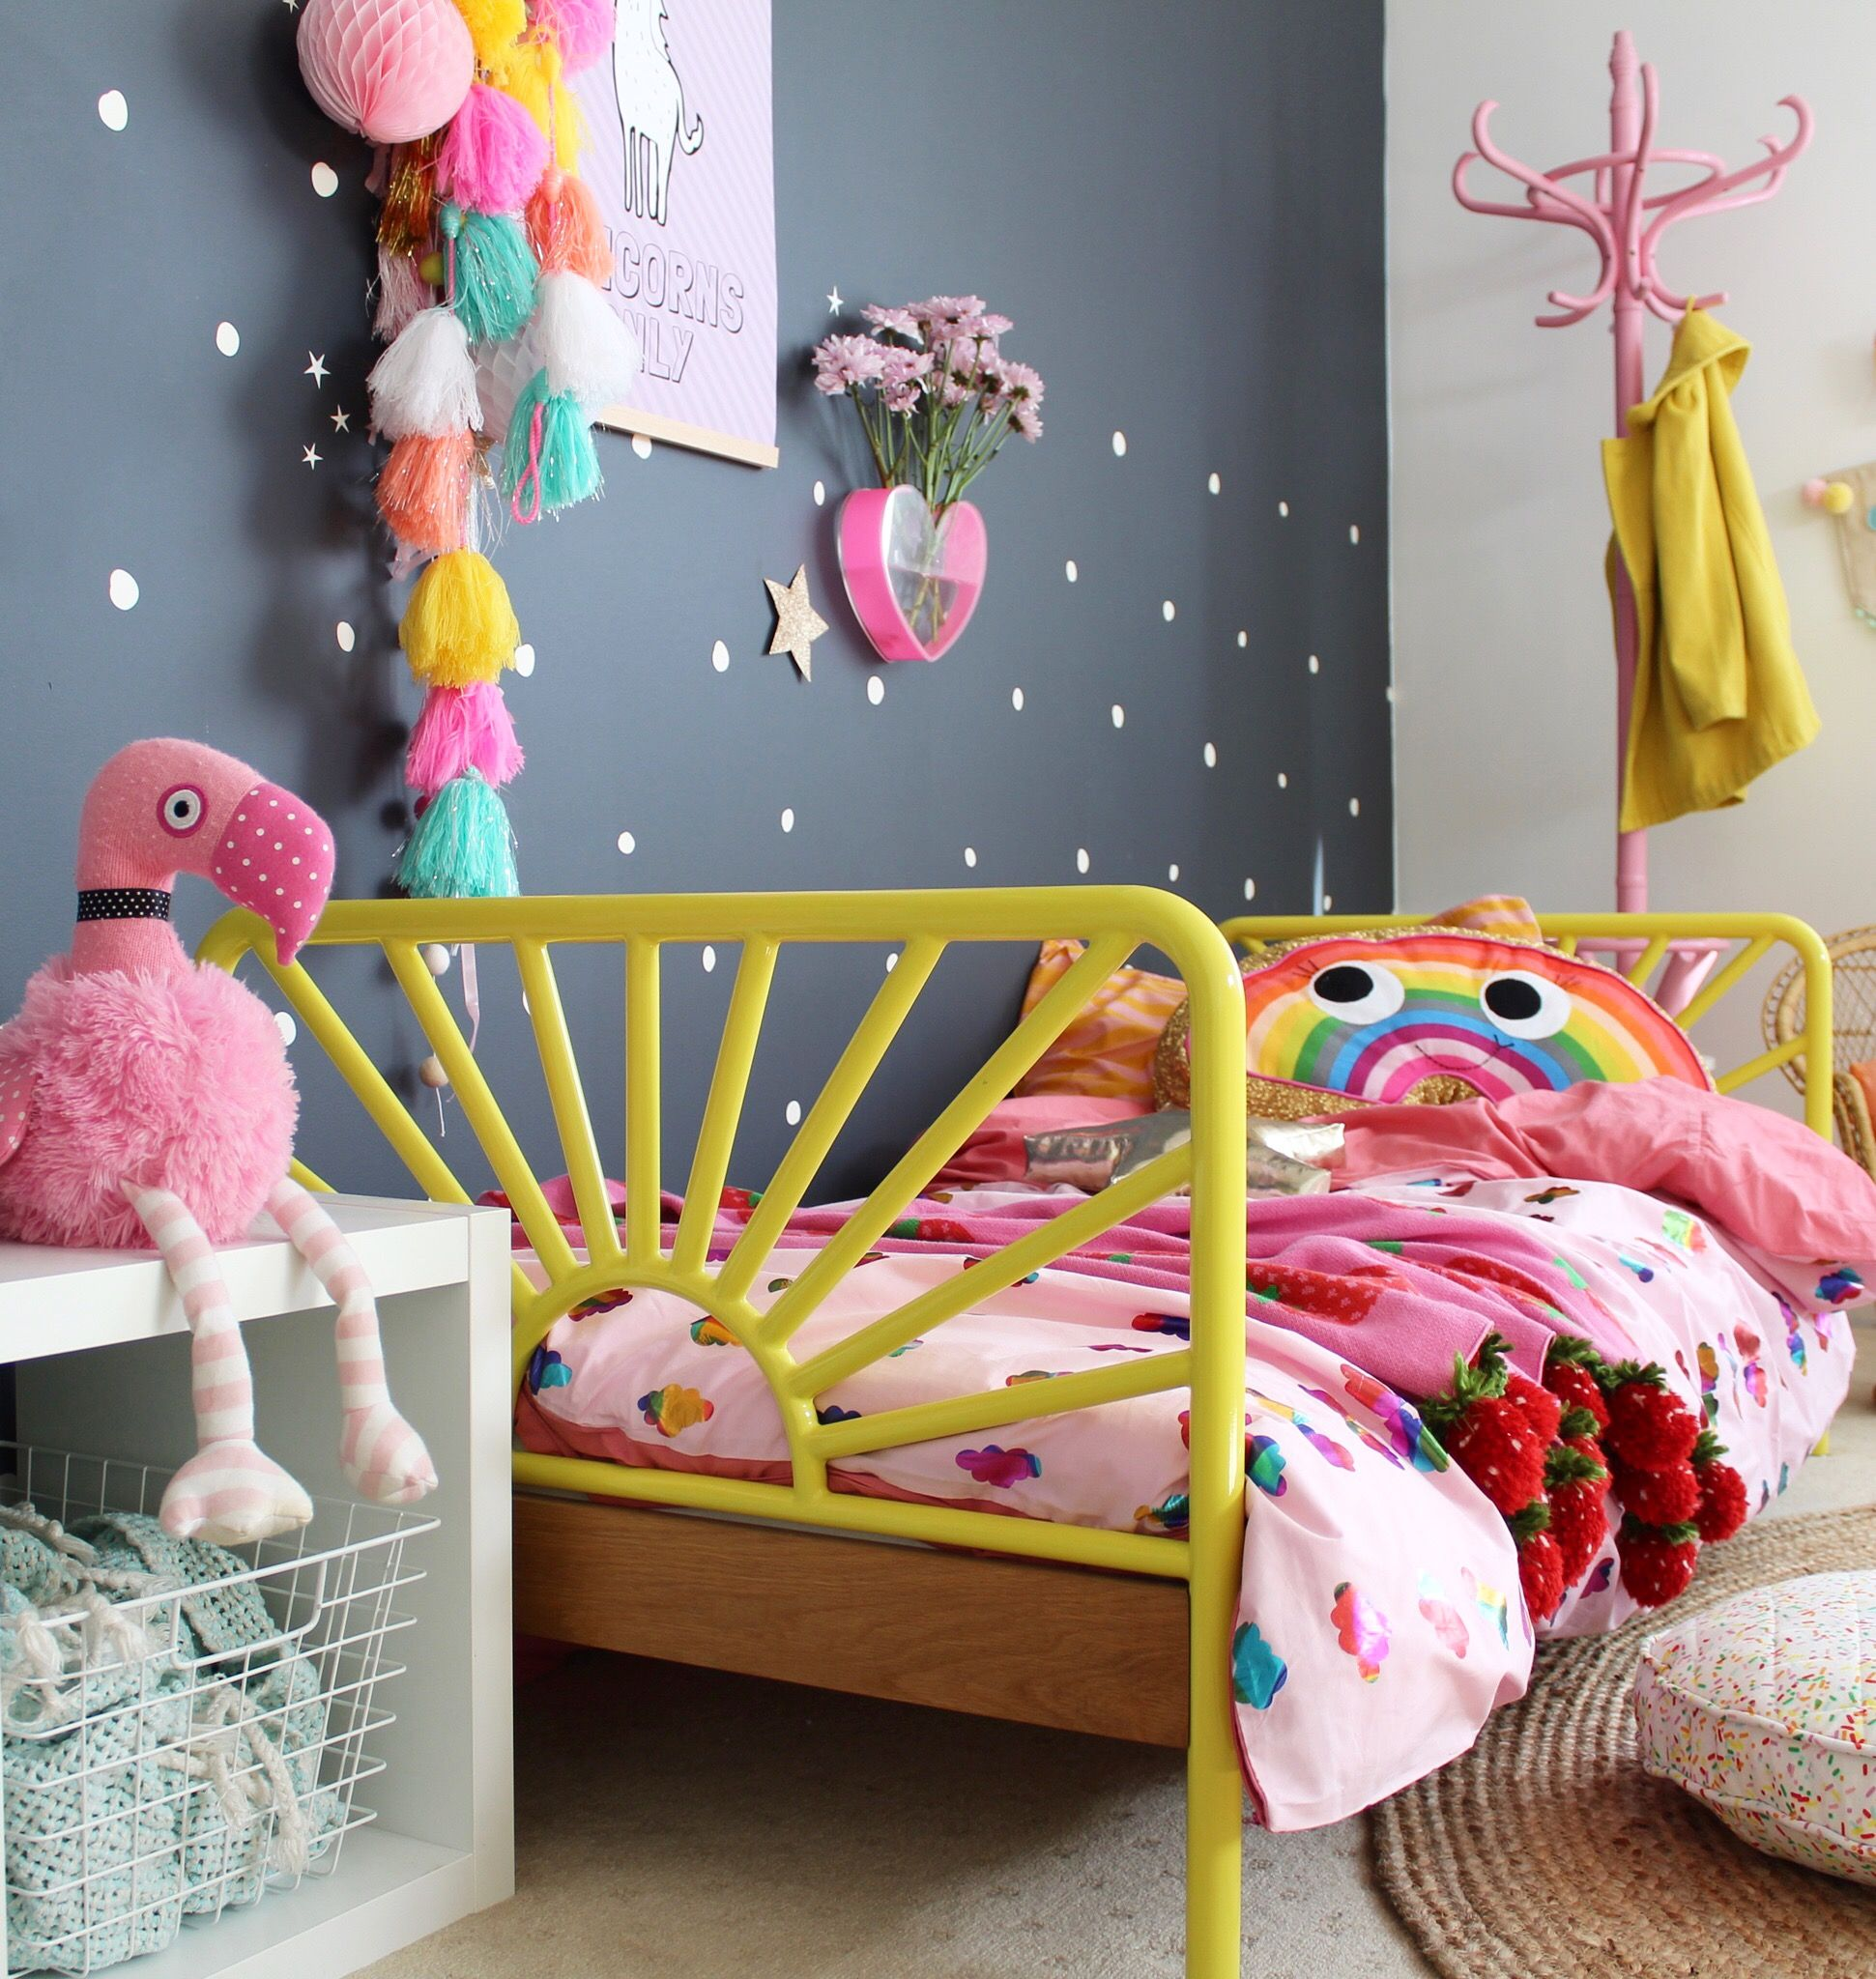 Kids Desire And Kids Room Decor: Indi's Toddler Room Makeover